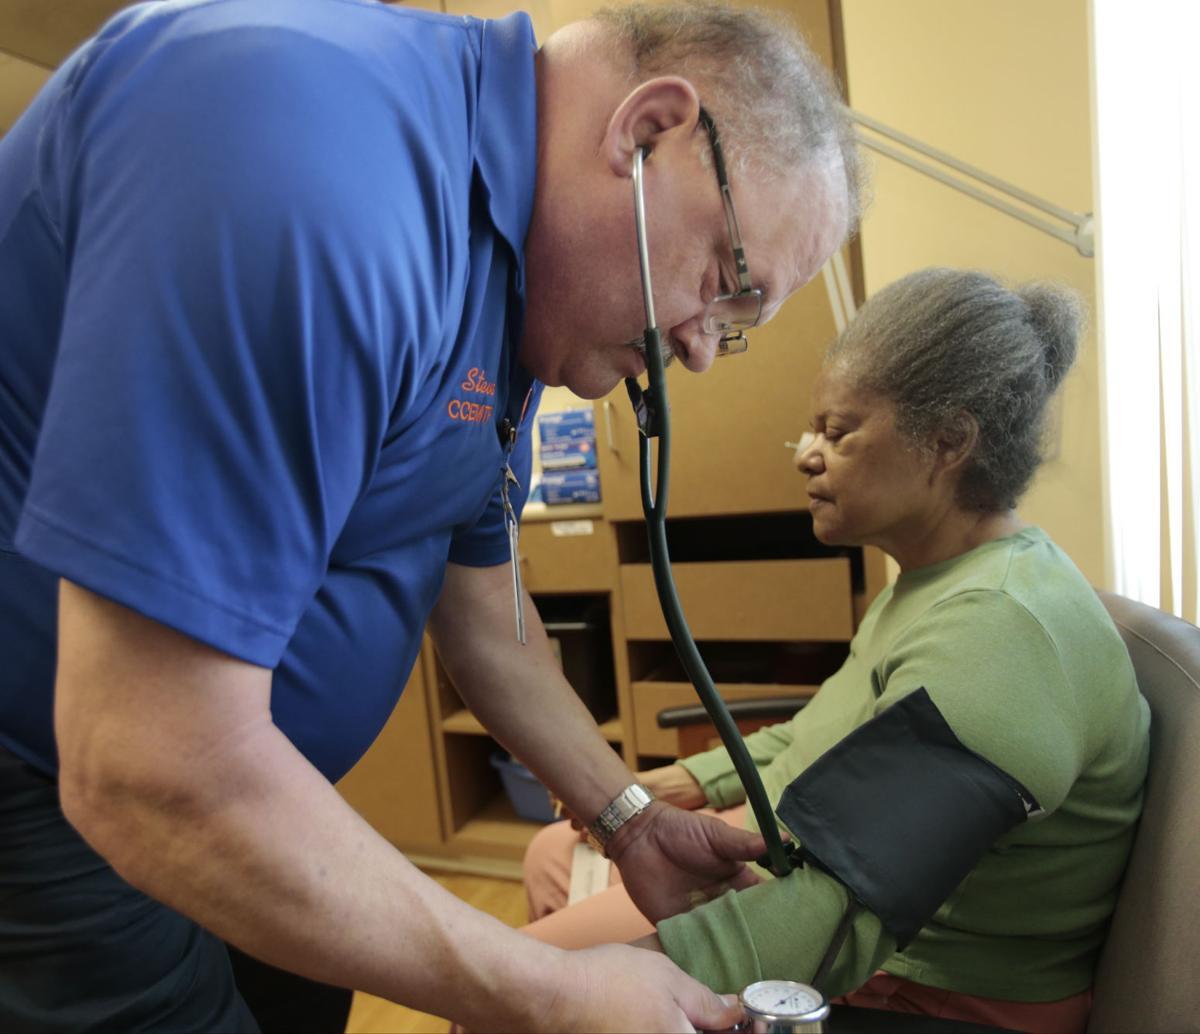 Steve Zank takes Priscilla Dunbar's blood pressure